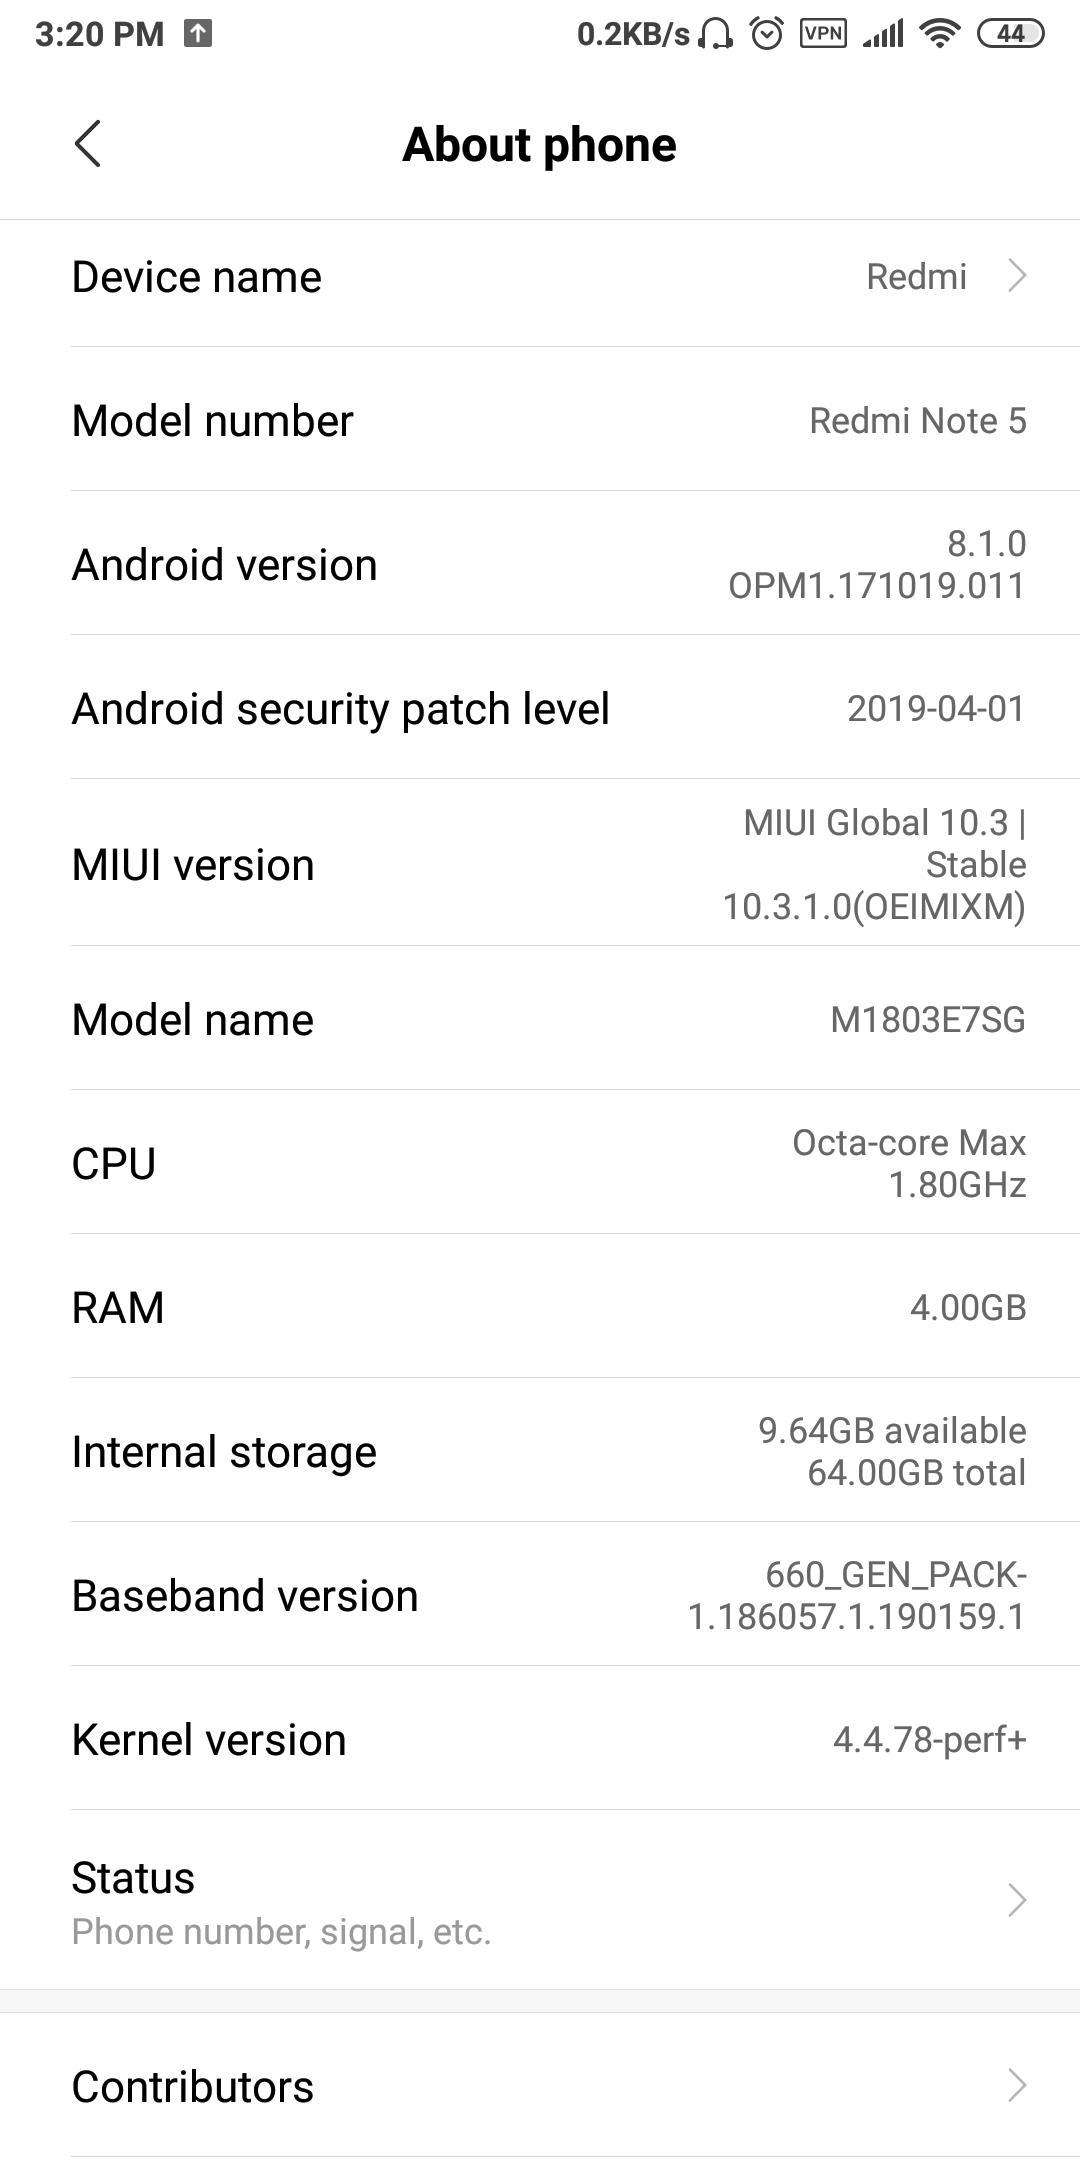 Screenshot_2020-09-15-15-20-35-149_com.android.settings.png